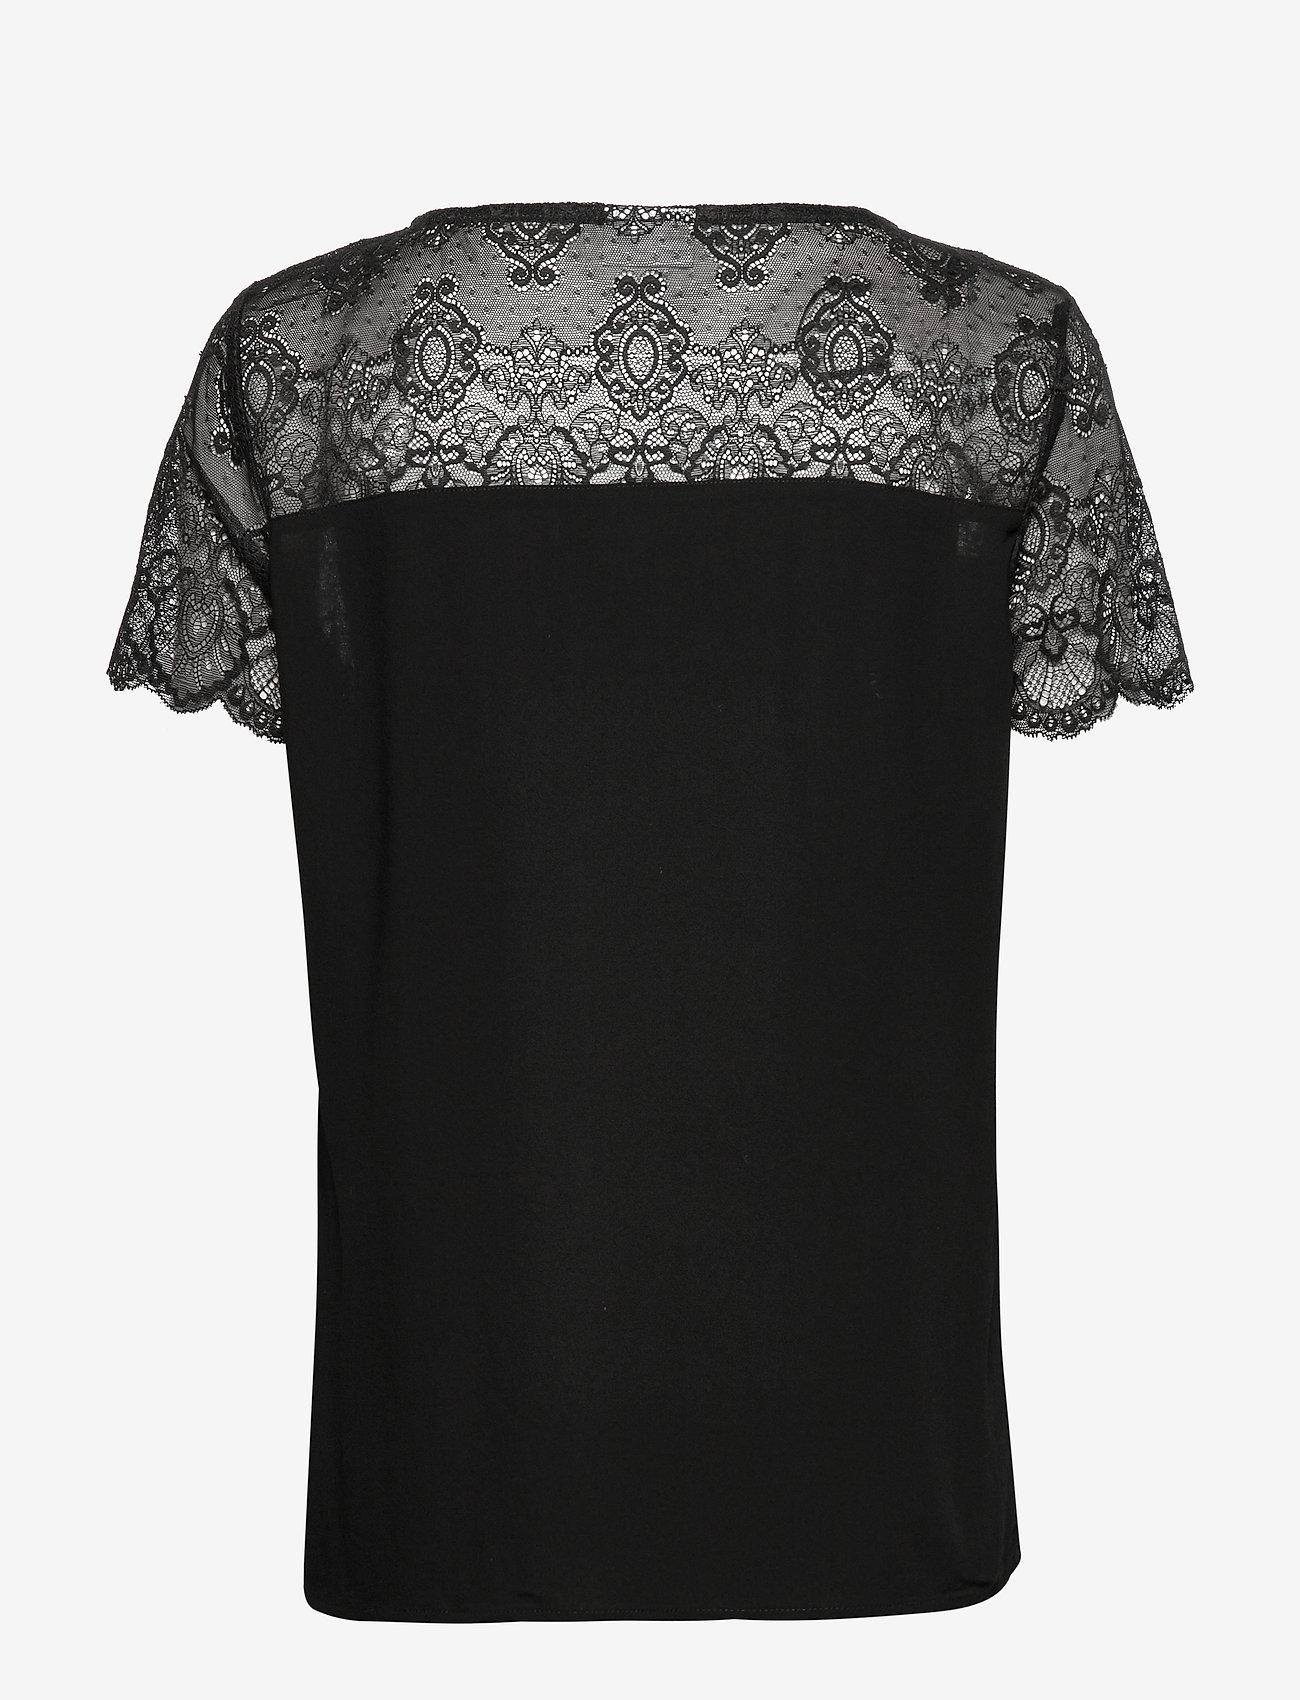 Vila - VIMERO LACE S/S TOP/SU -NOOS - t-shirts - black - 1